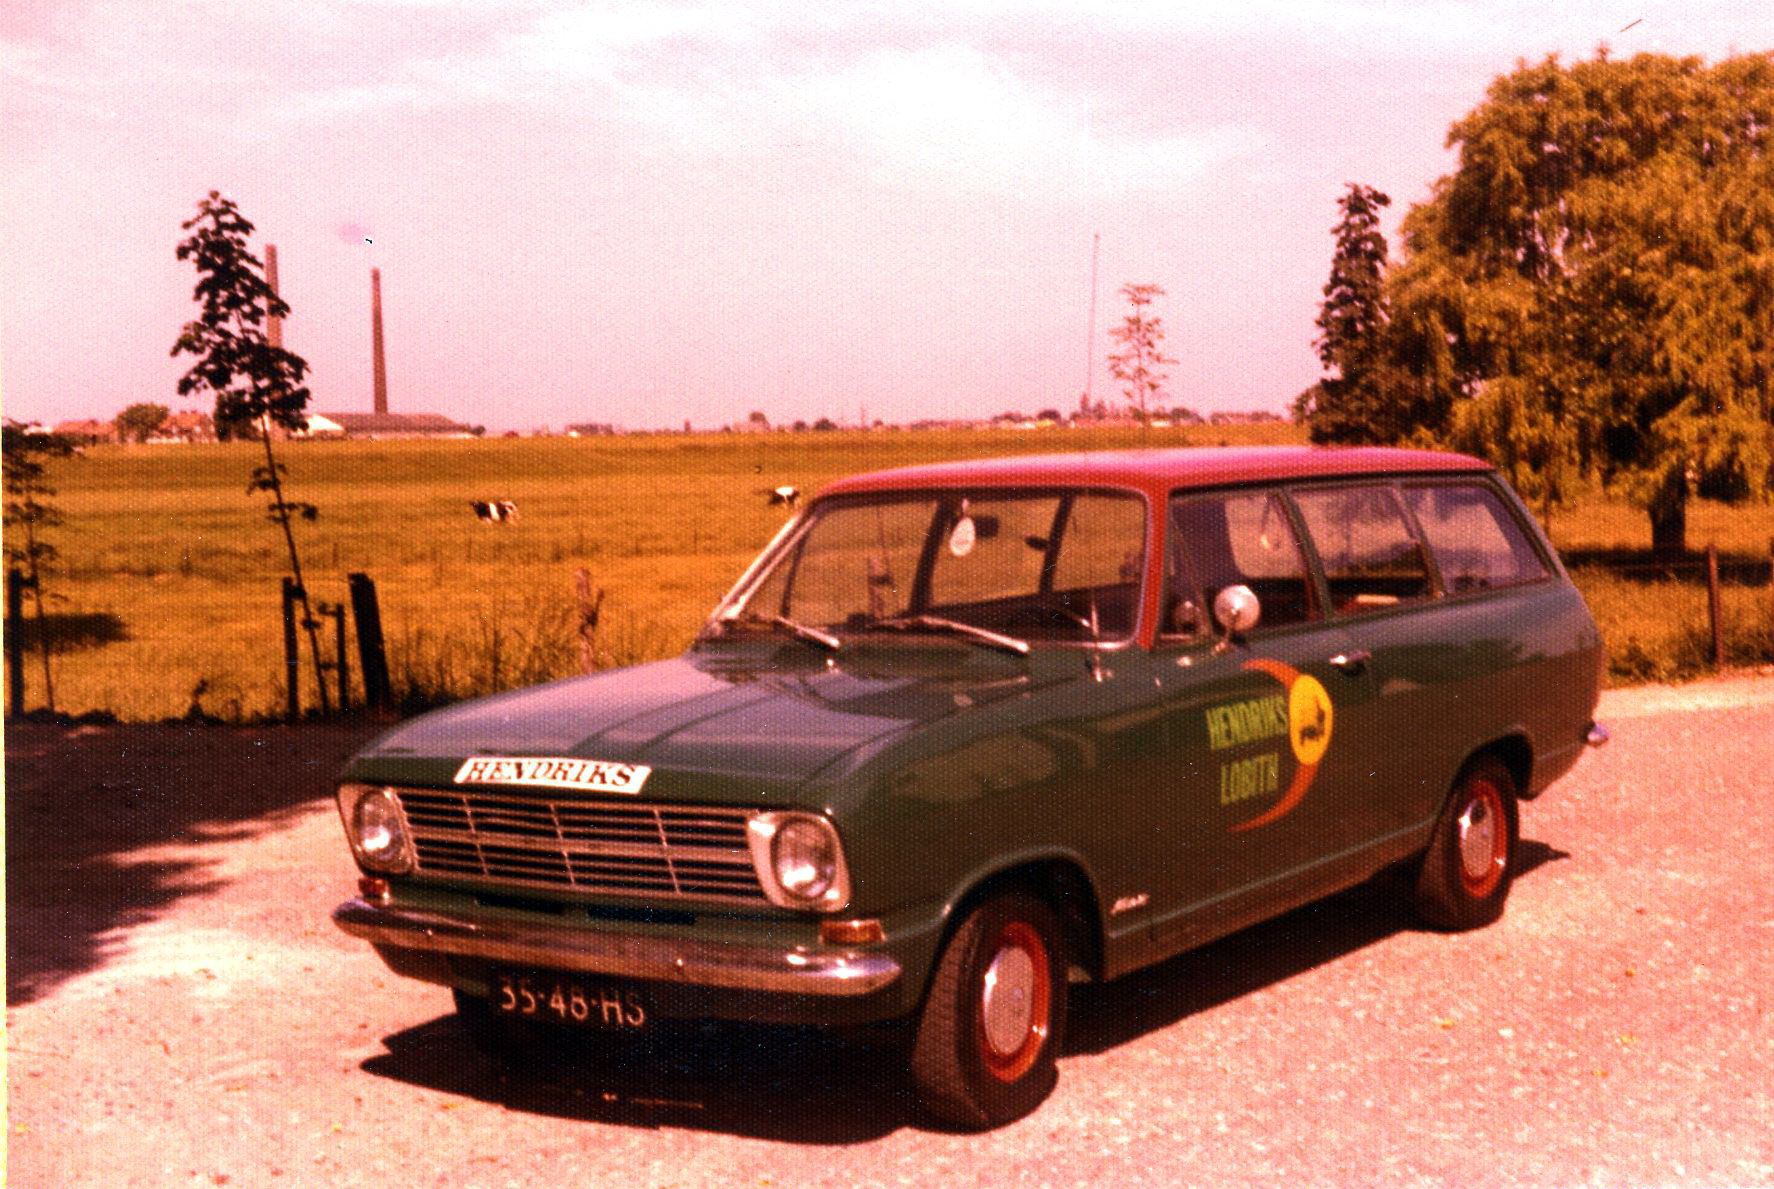 Hendriks-Lobith-Opel-Kadett-3548HS